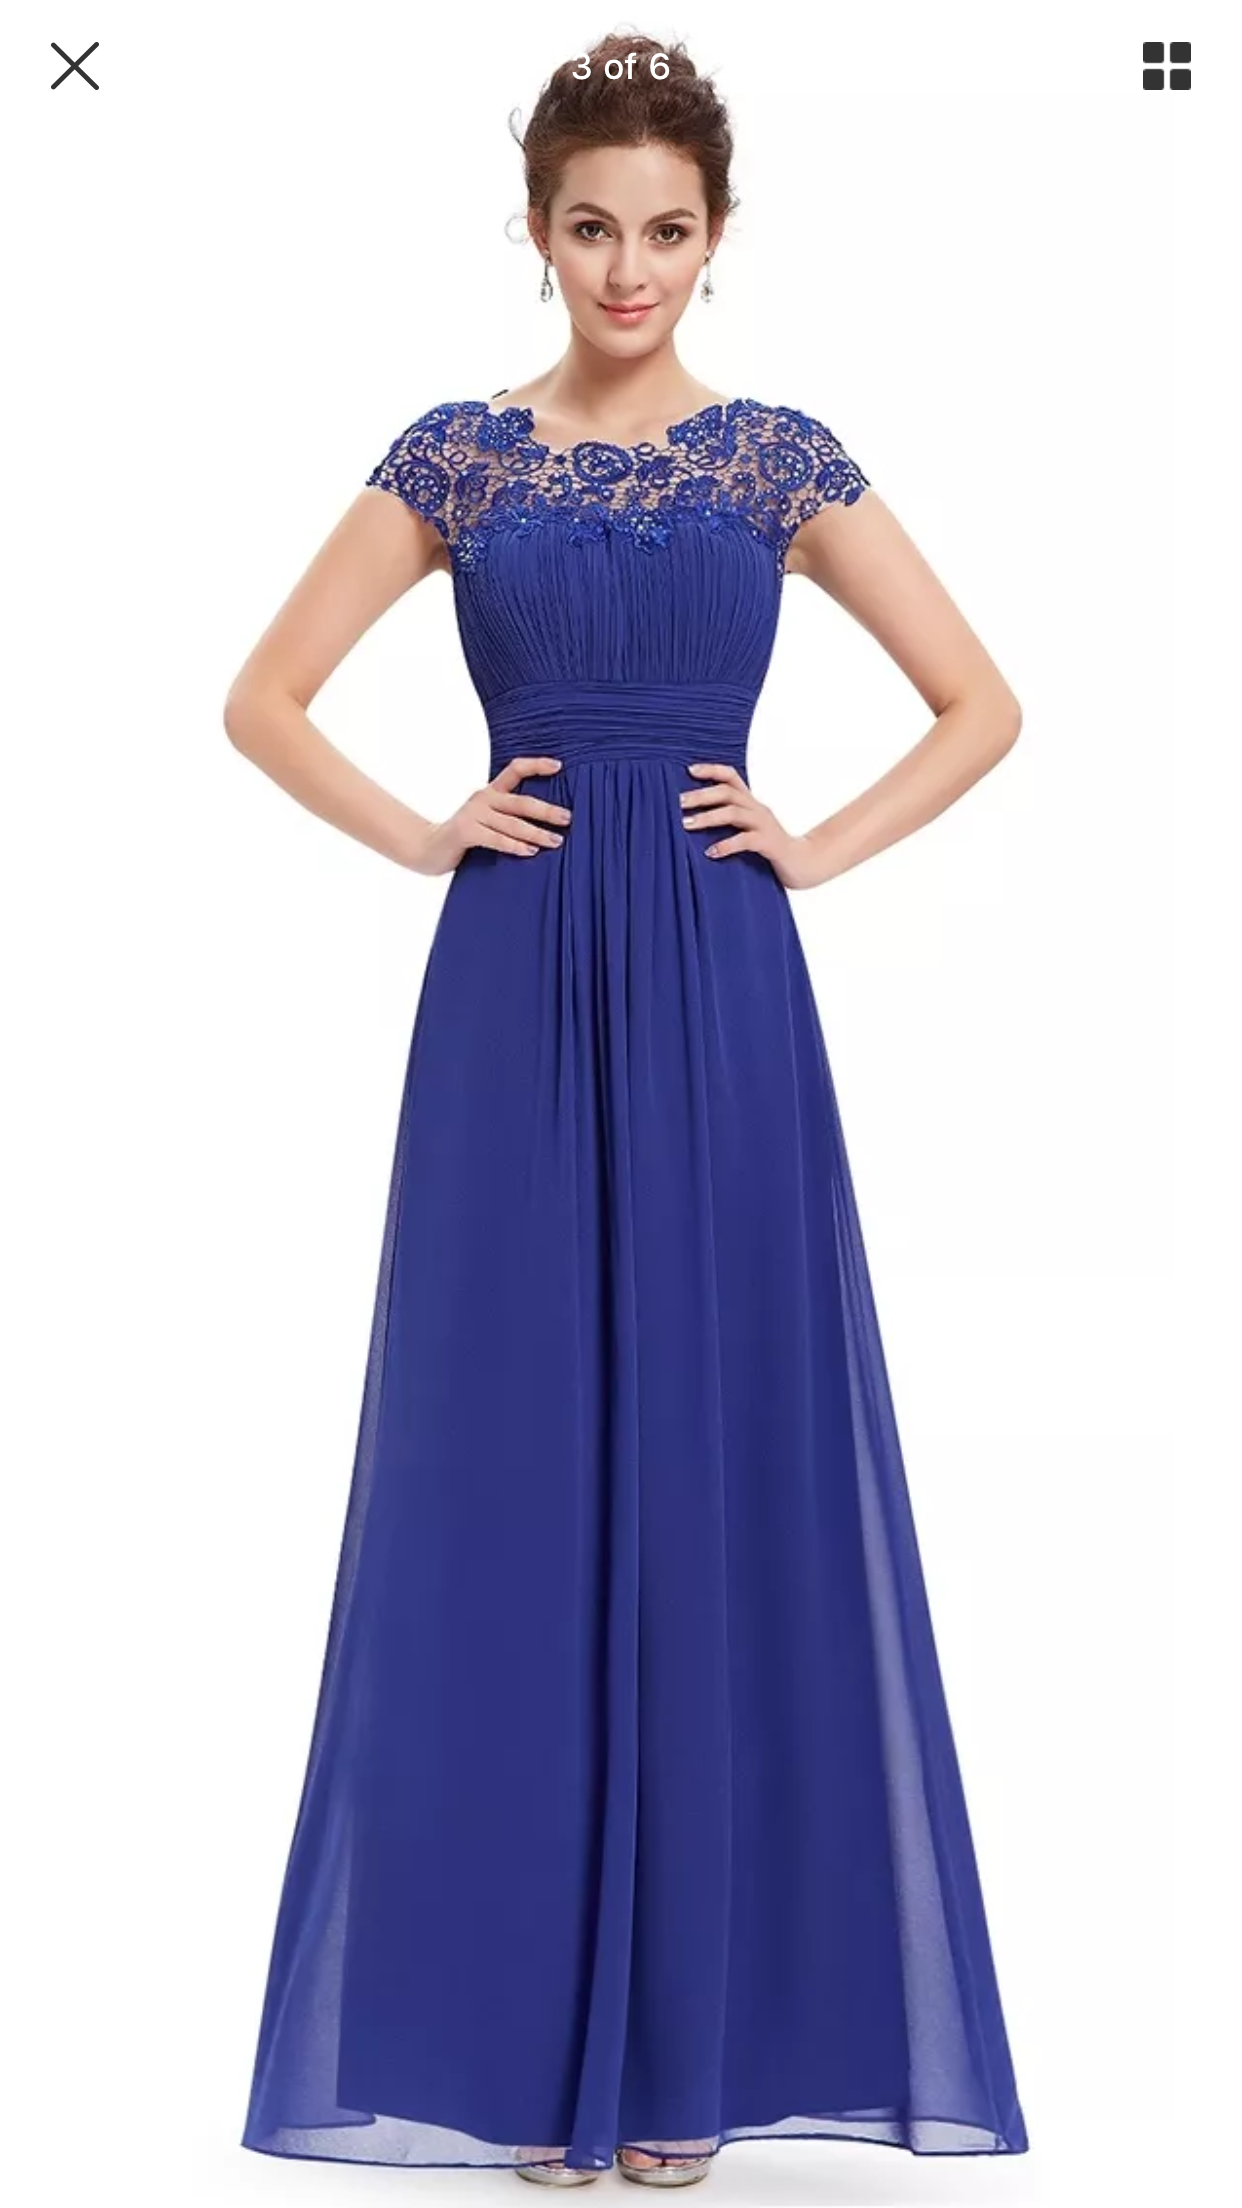 UK Ever-Pretty Elegant Long Chiffon Prom Dresses Formal  Evening Ball Gown 09993